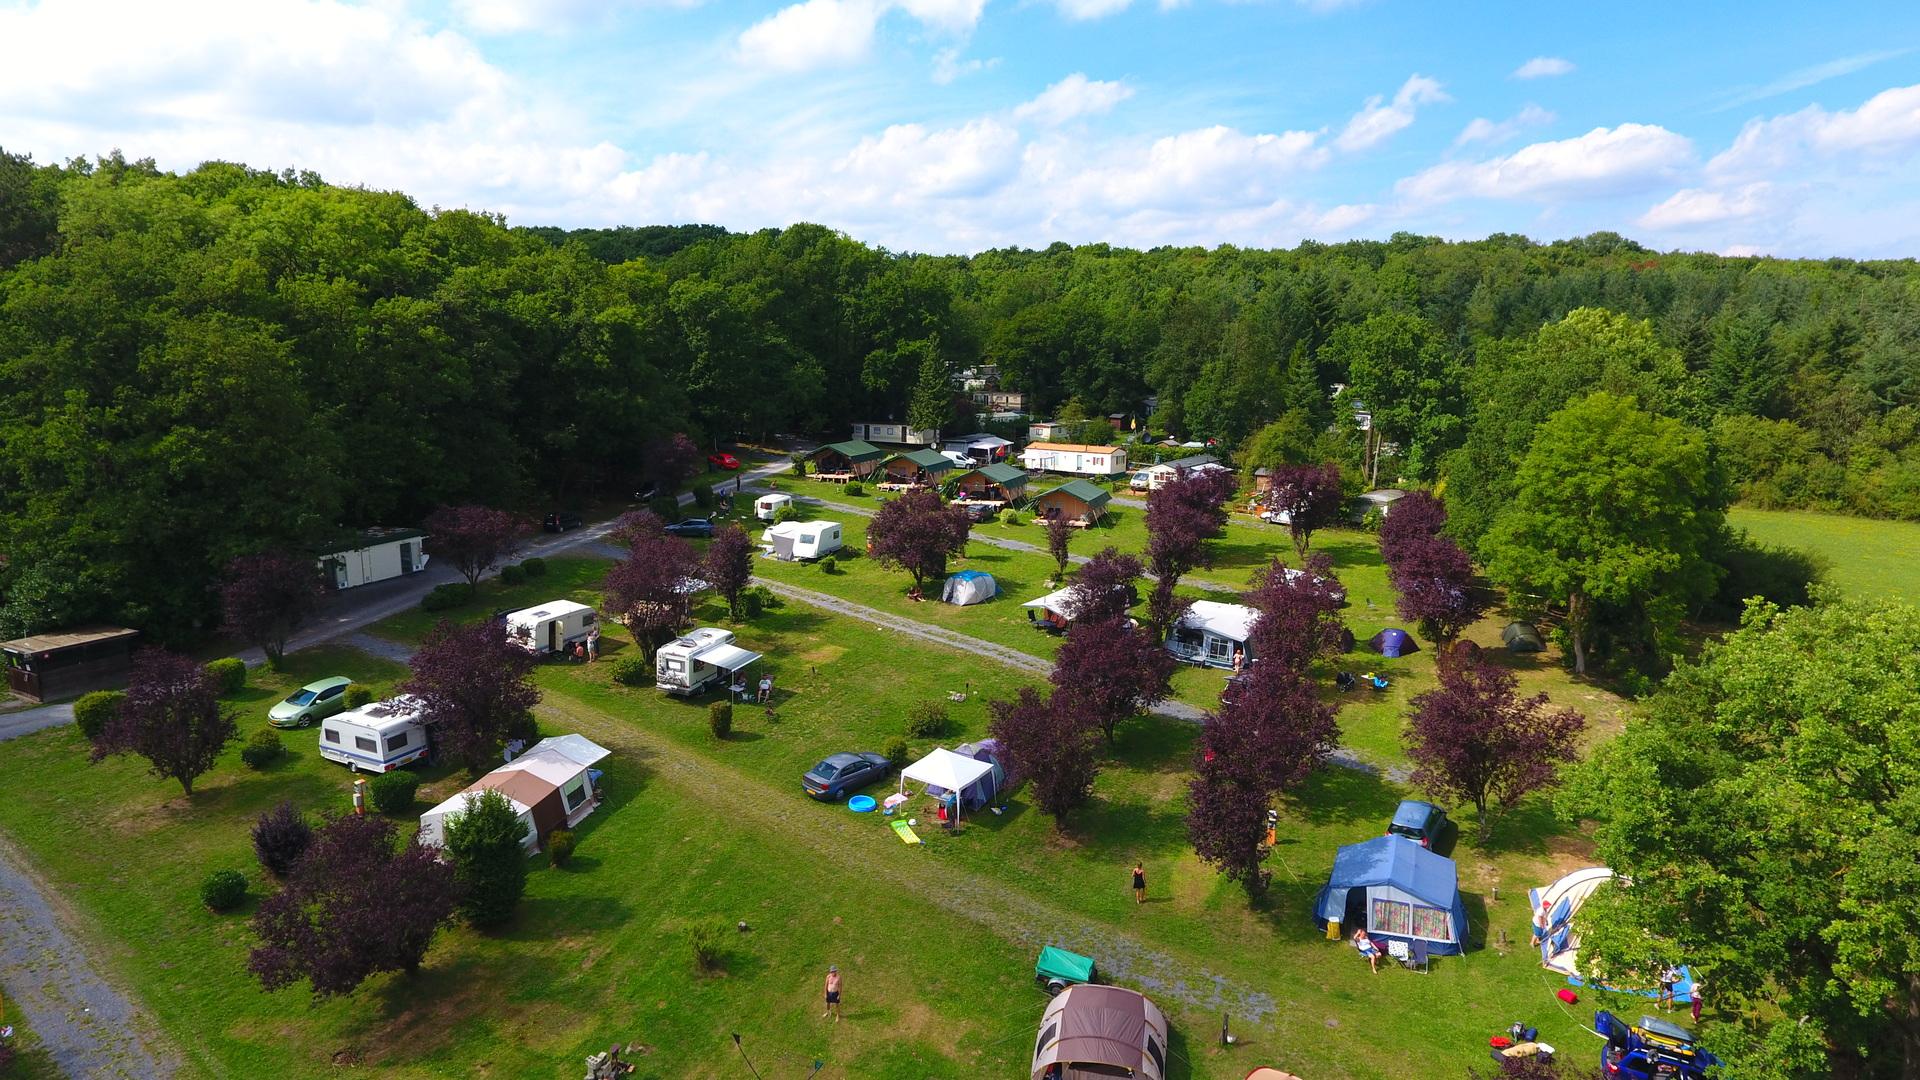 Belgie-AveetAuffe-Camping%20Le%20Roptai-ExtraLarge Campings België